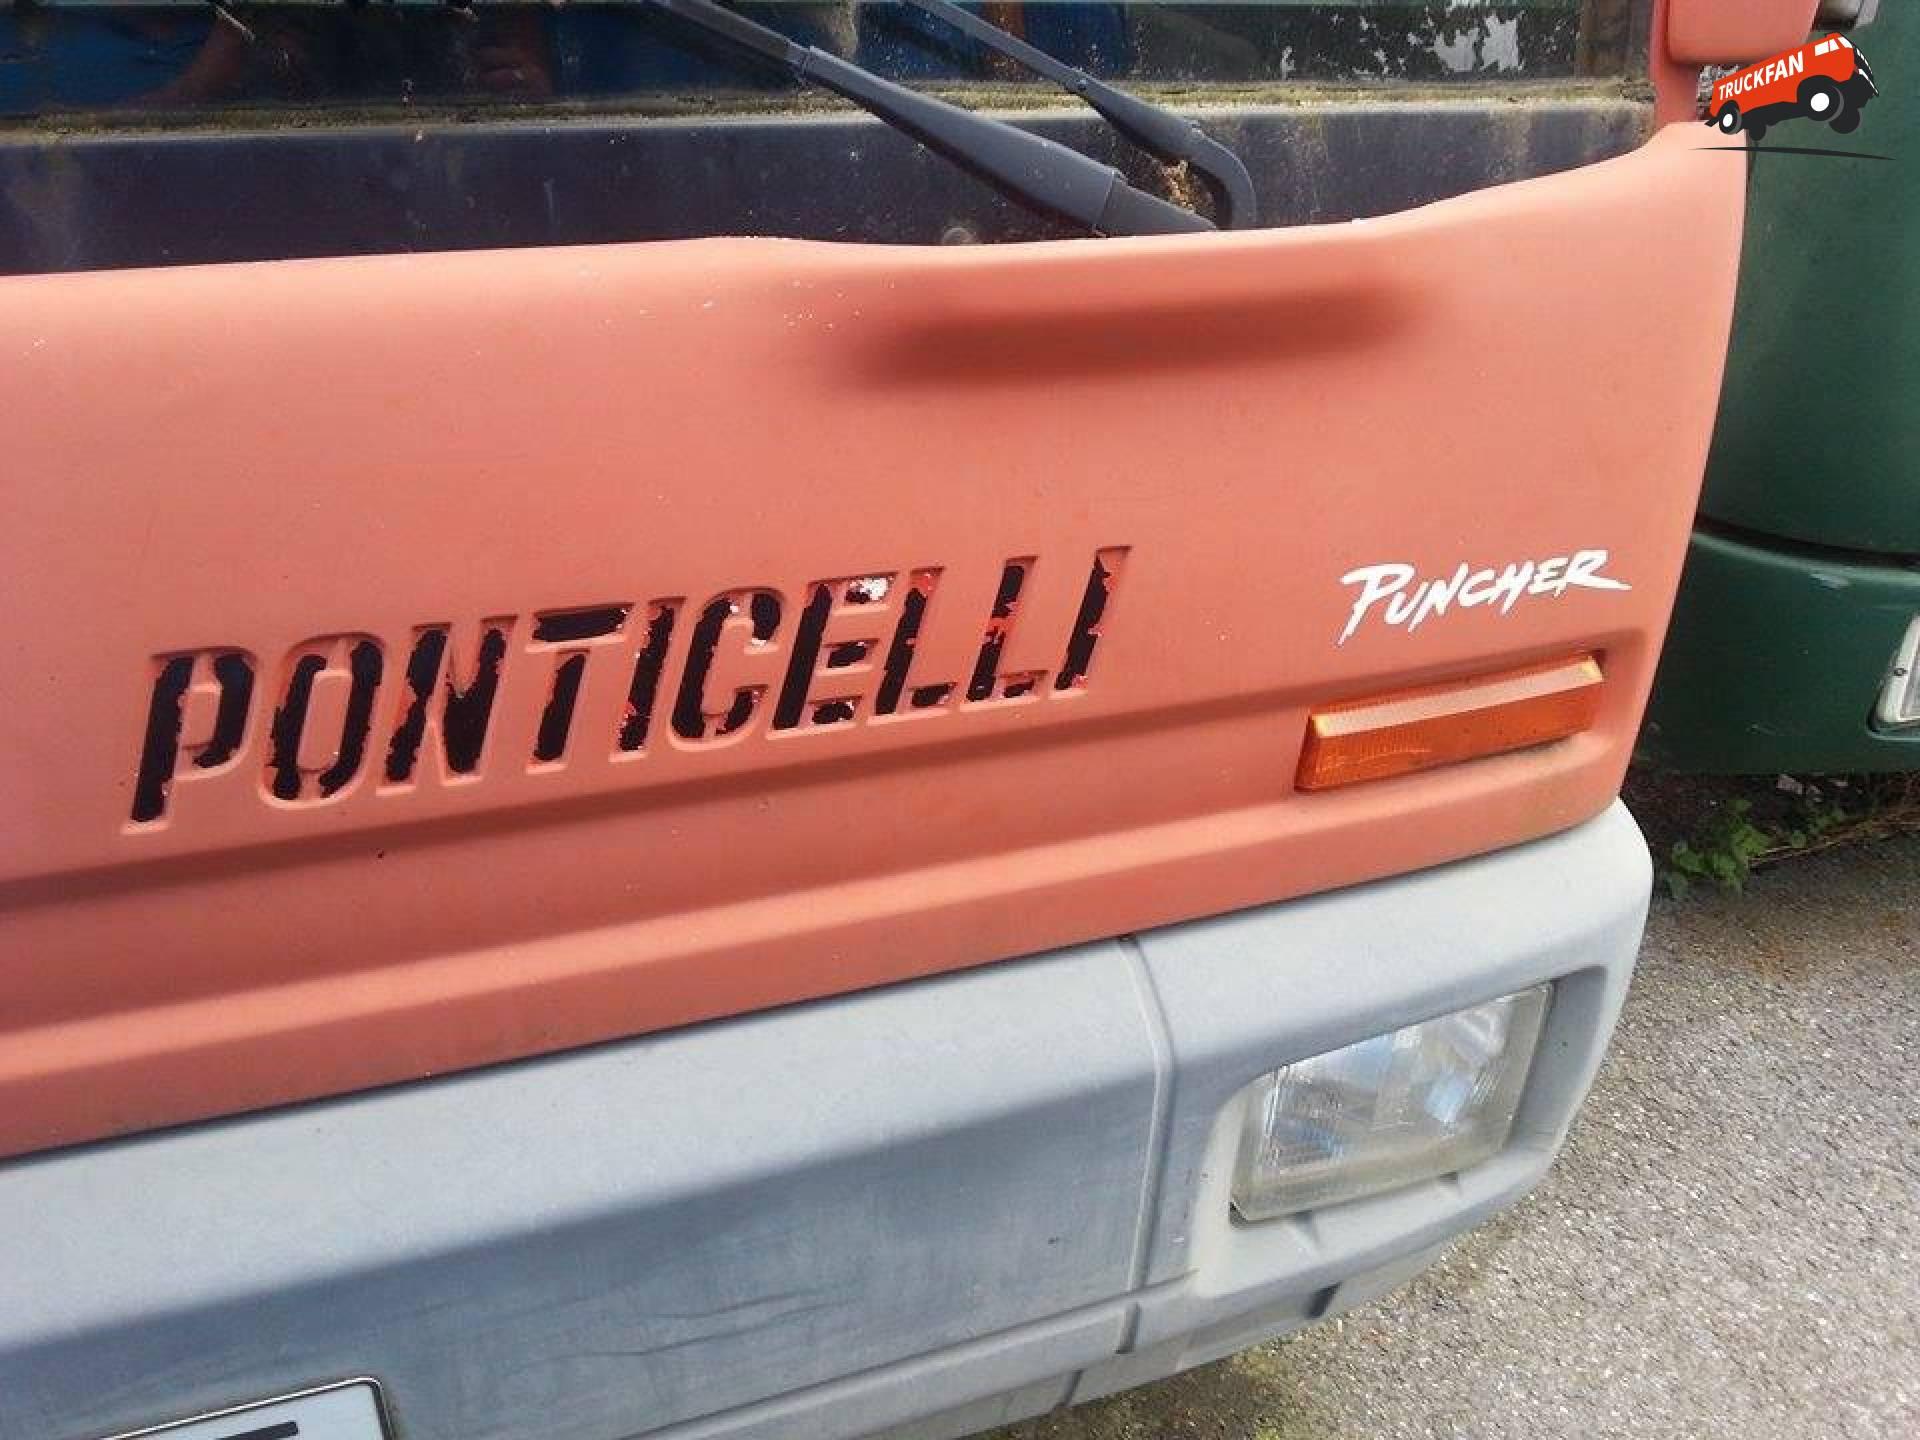 Ponticelli Puncher